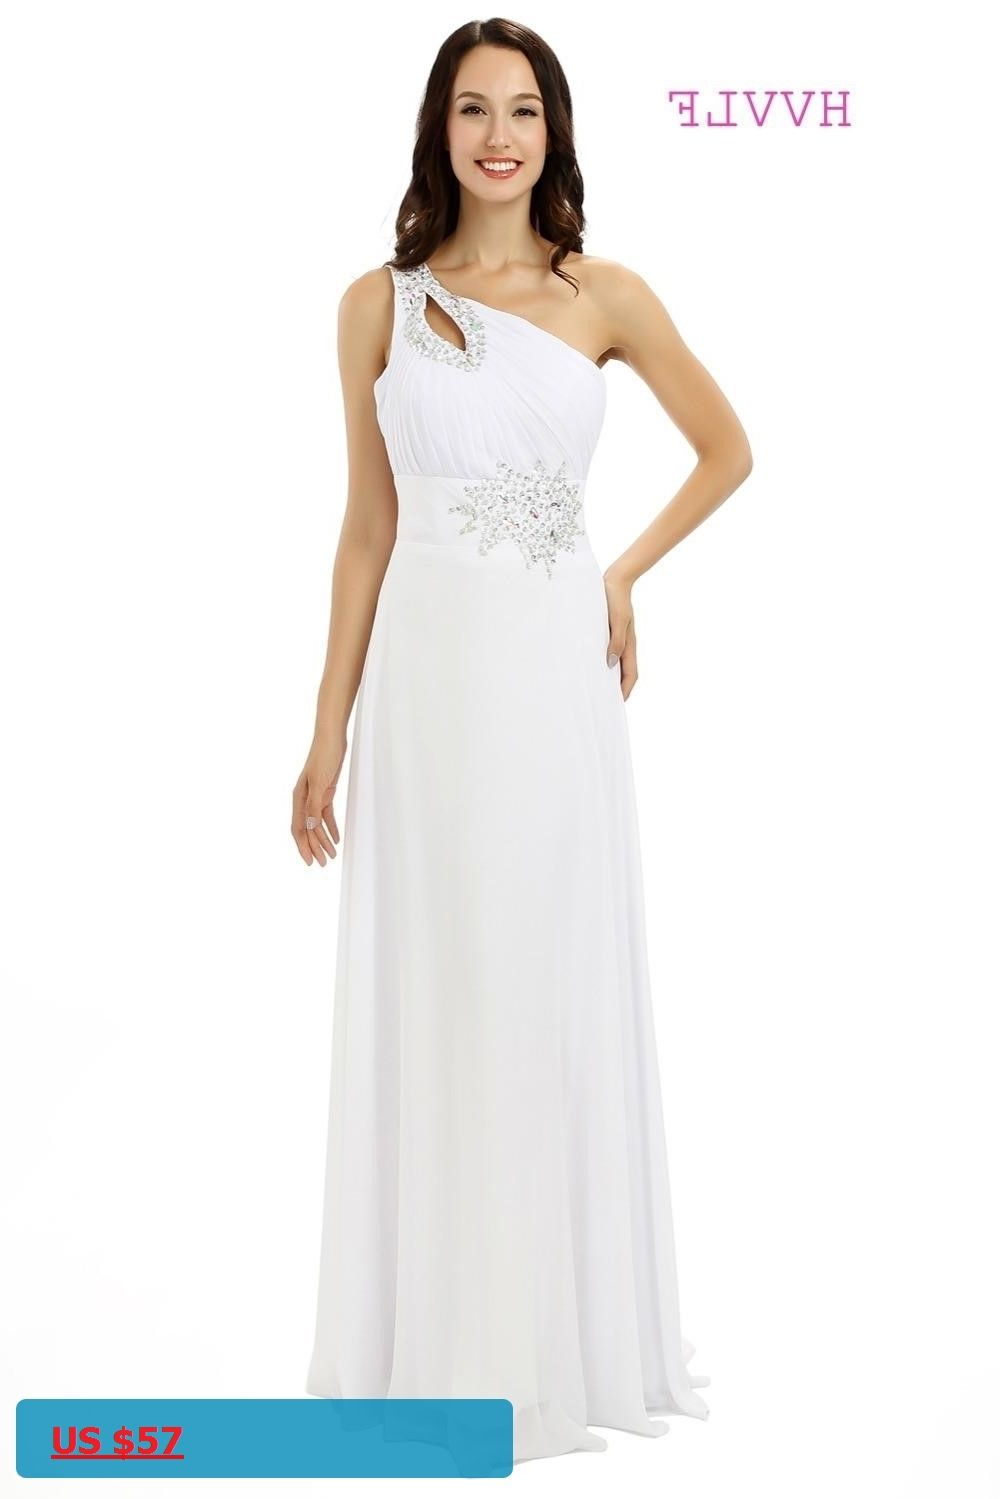 White 2018 cheap bridesmaid dresses under 50 a line one shoulder white 2018 cheap bridesmaid dresses under 50 a line one shoulder floor length chiffon ombrellifo Choice Image